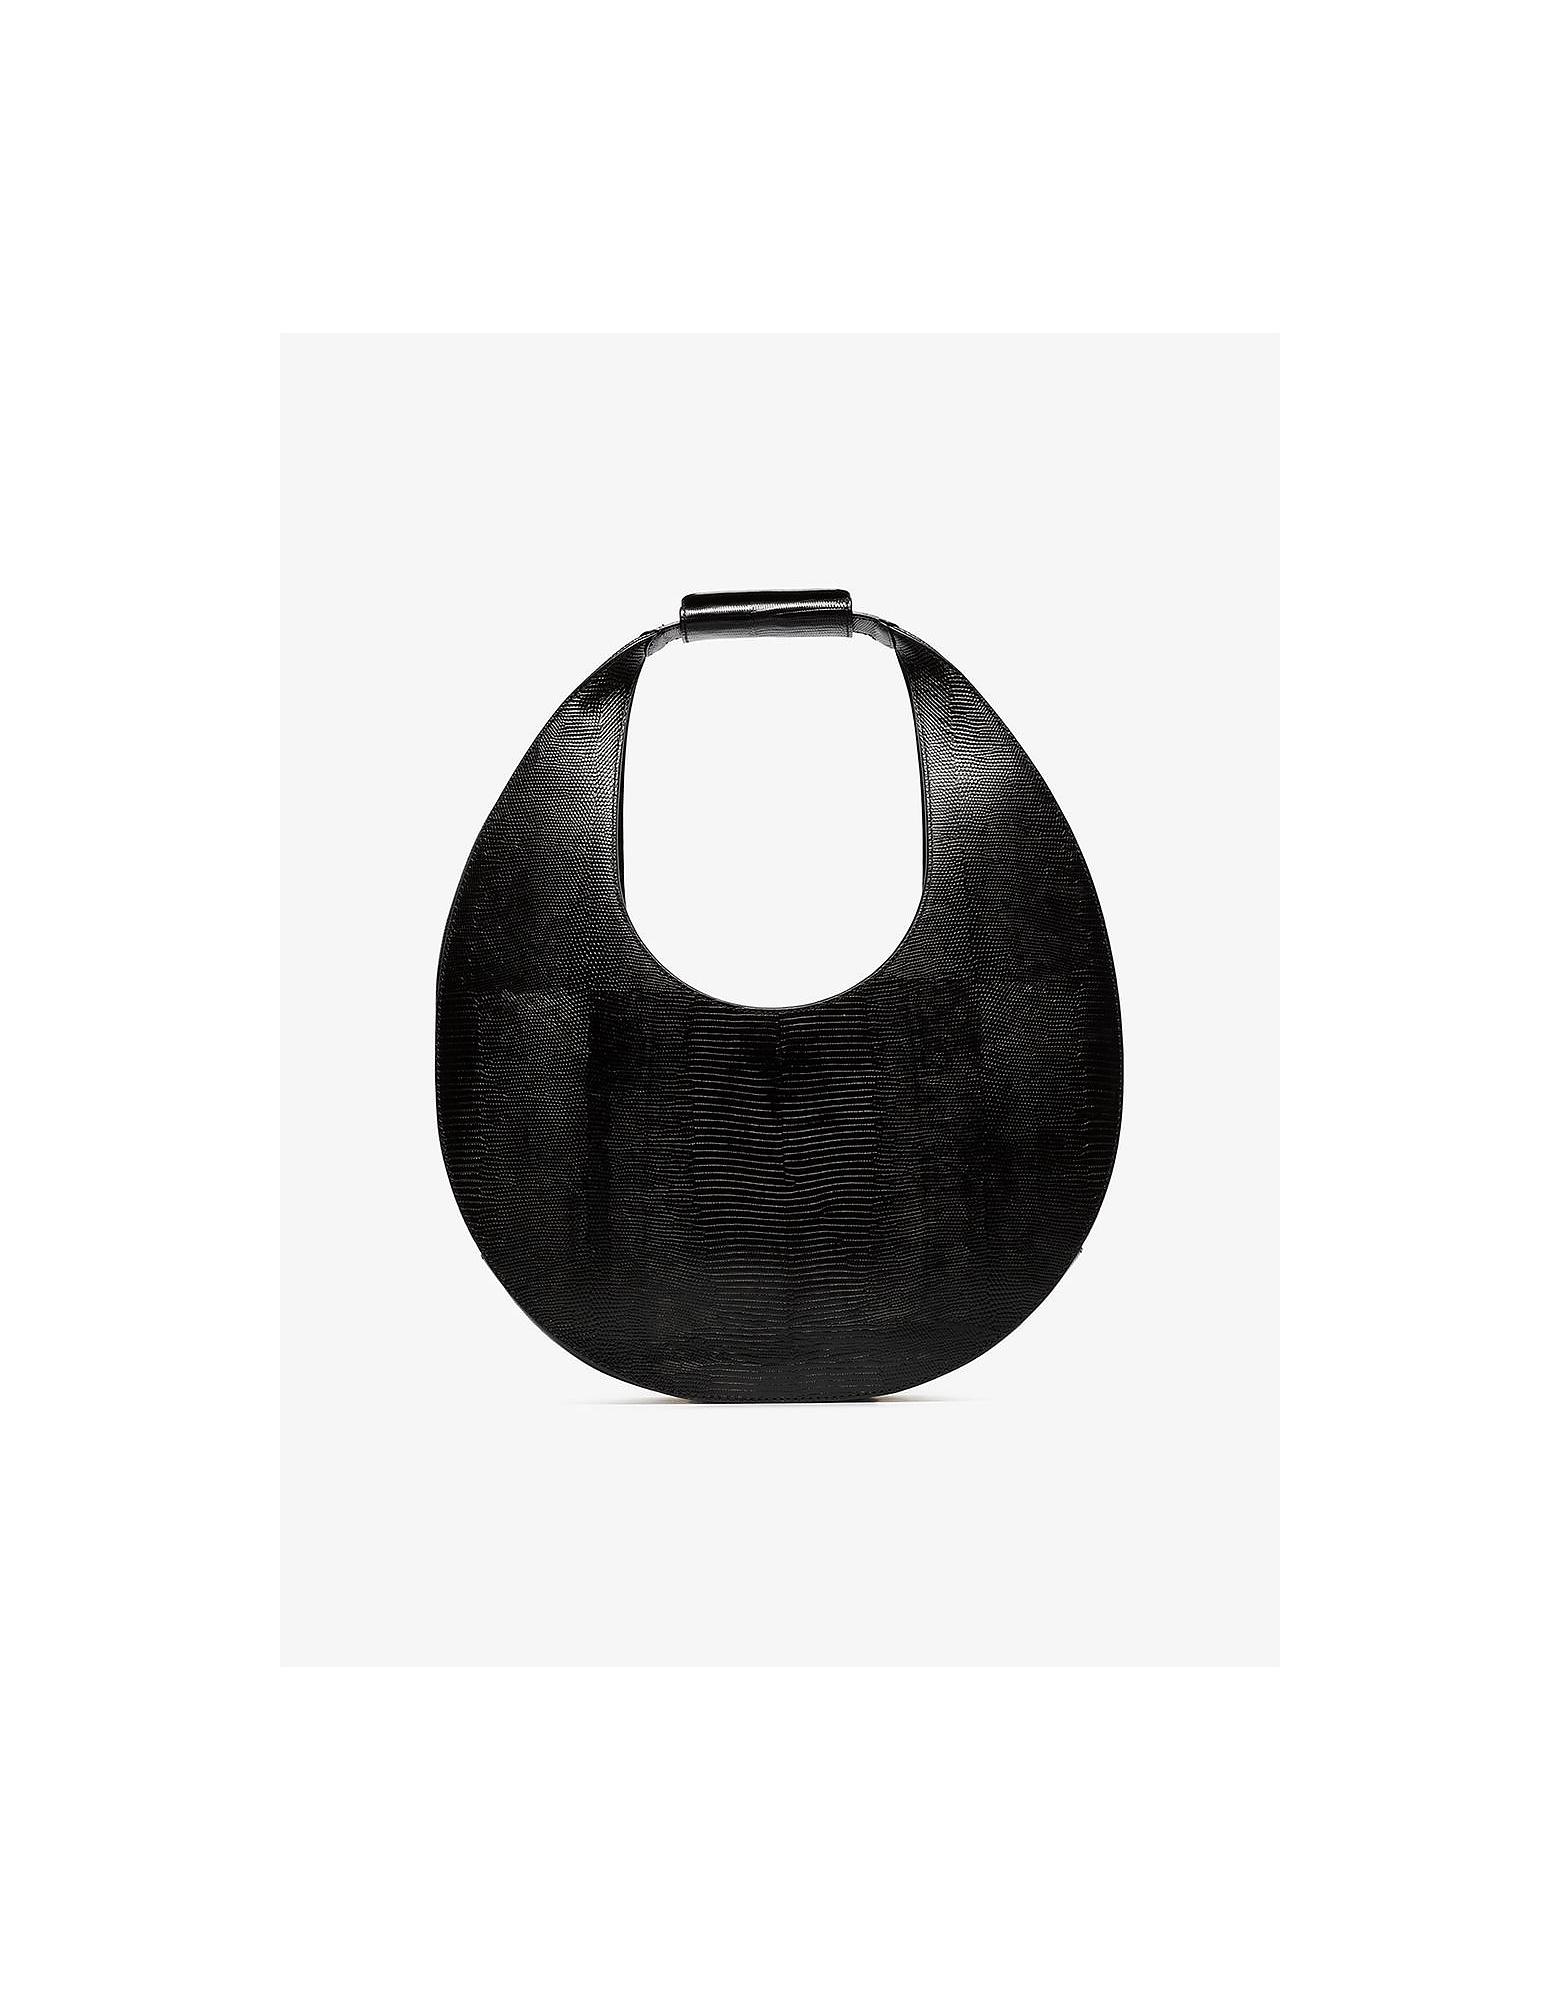 Staud Designer Handbags, Large Moon Lizard Embossed Shoulder Bag